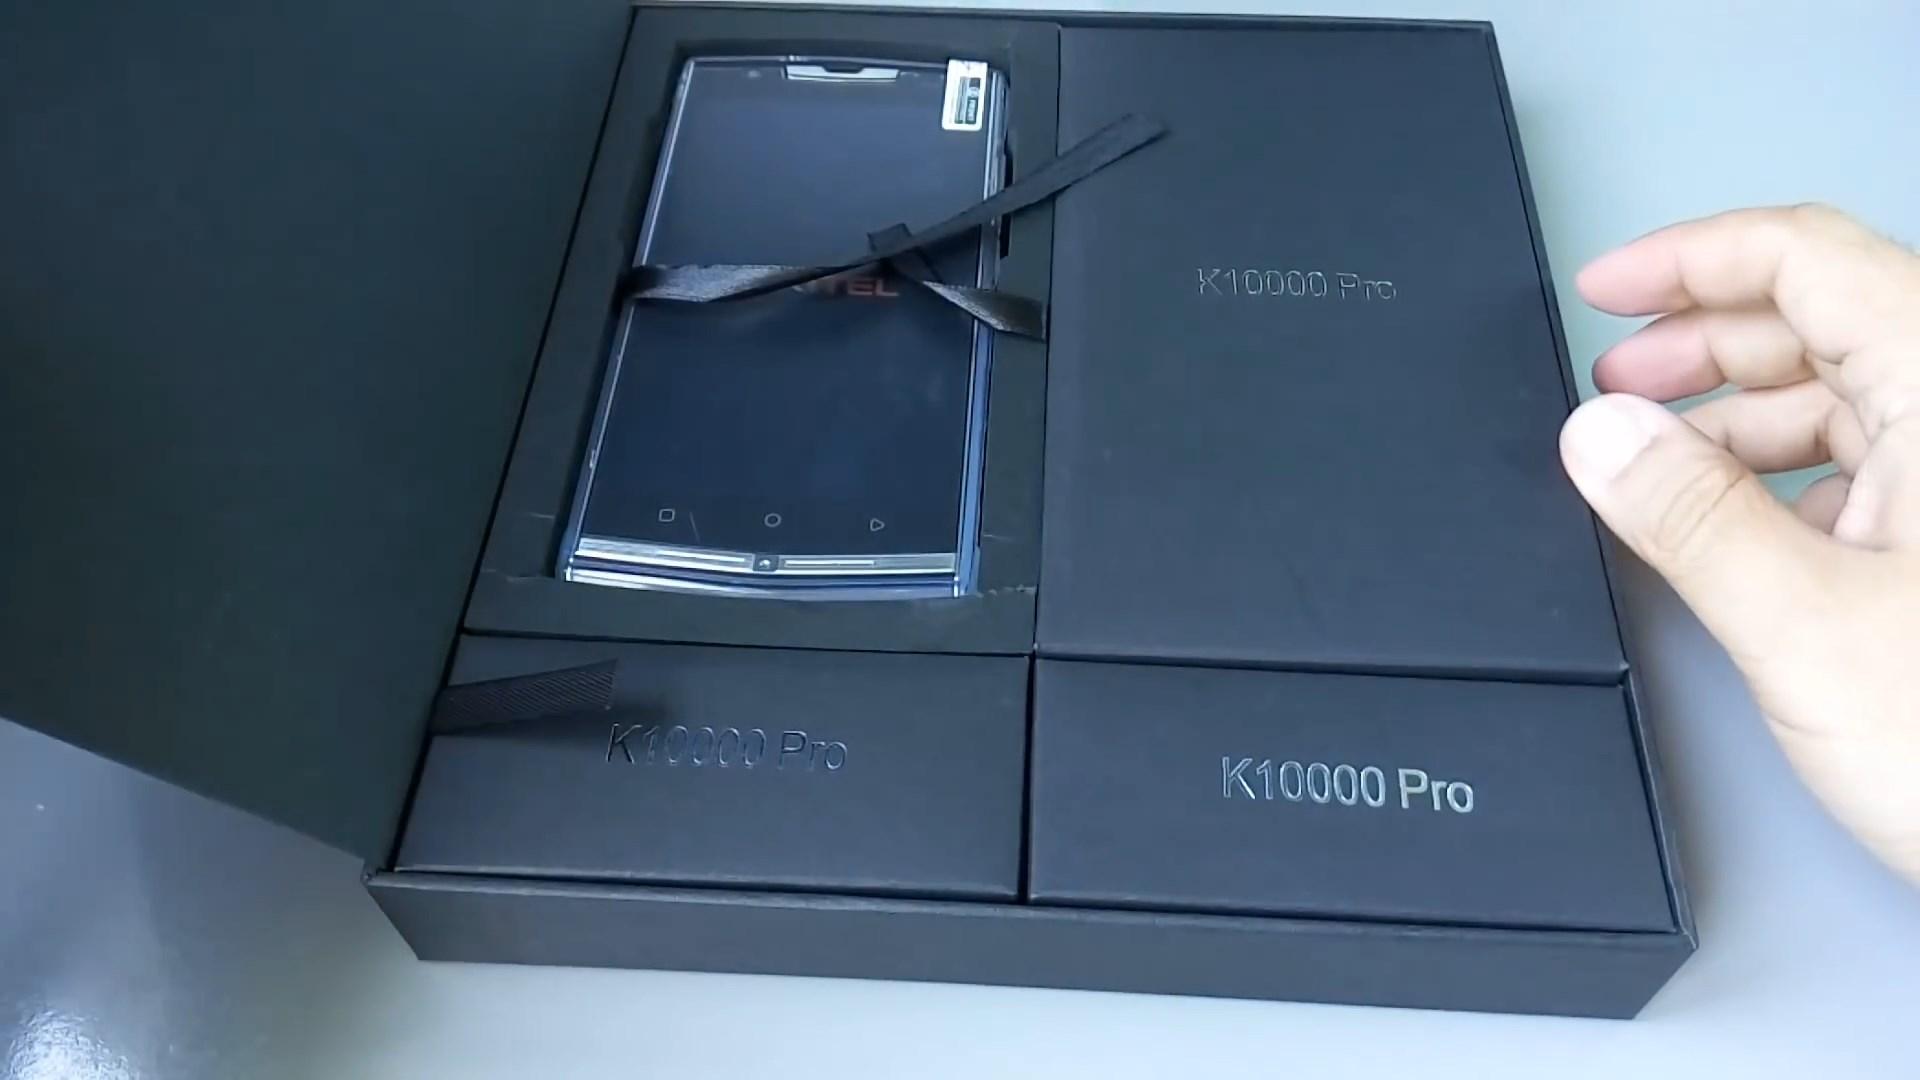 Комплектация Oukitel K10000 Pro